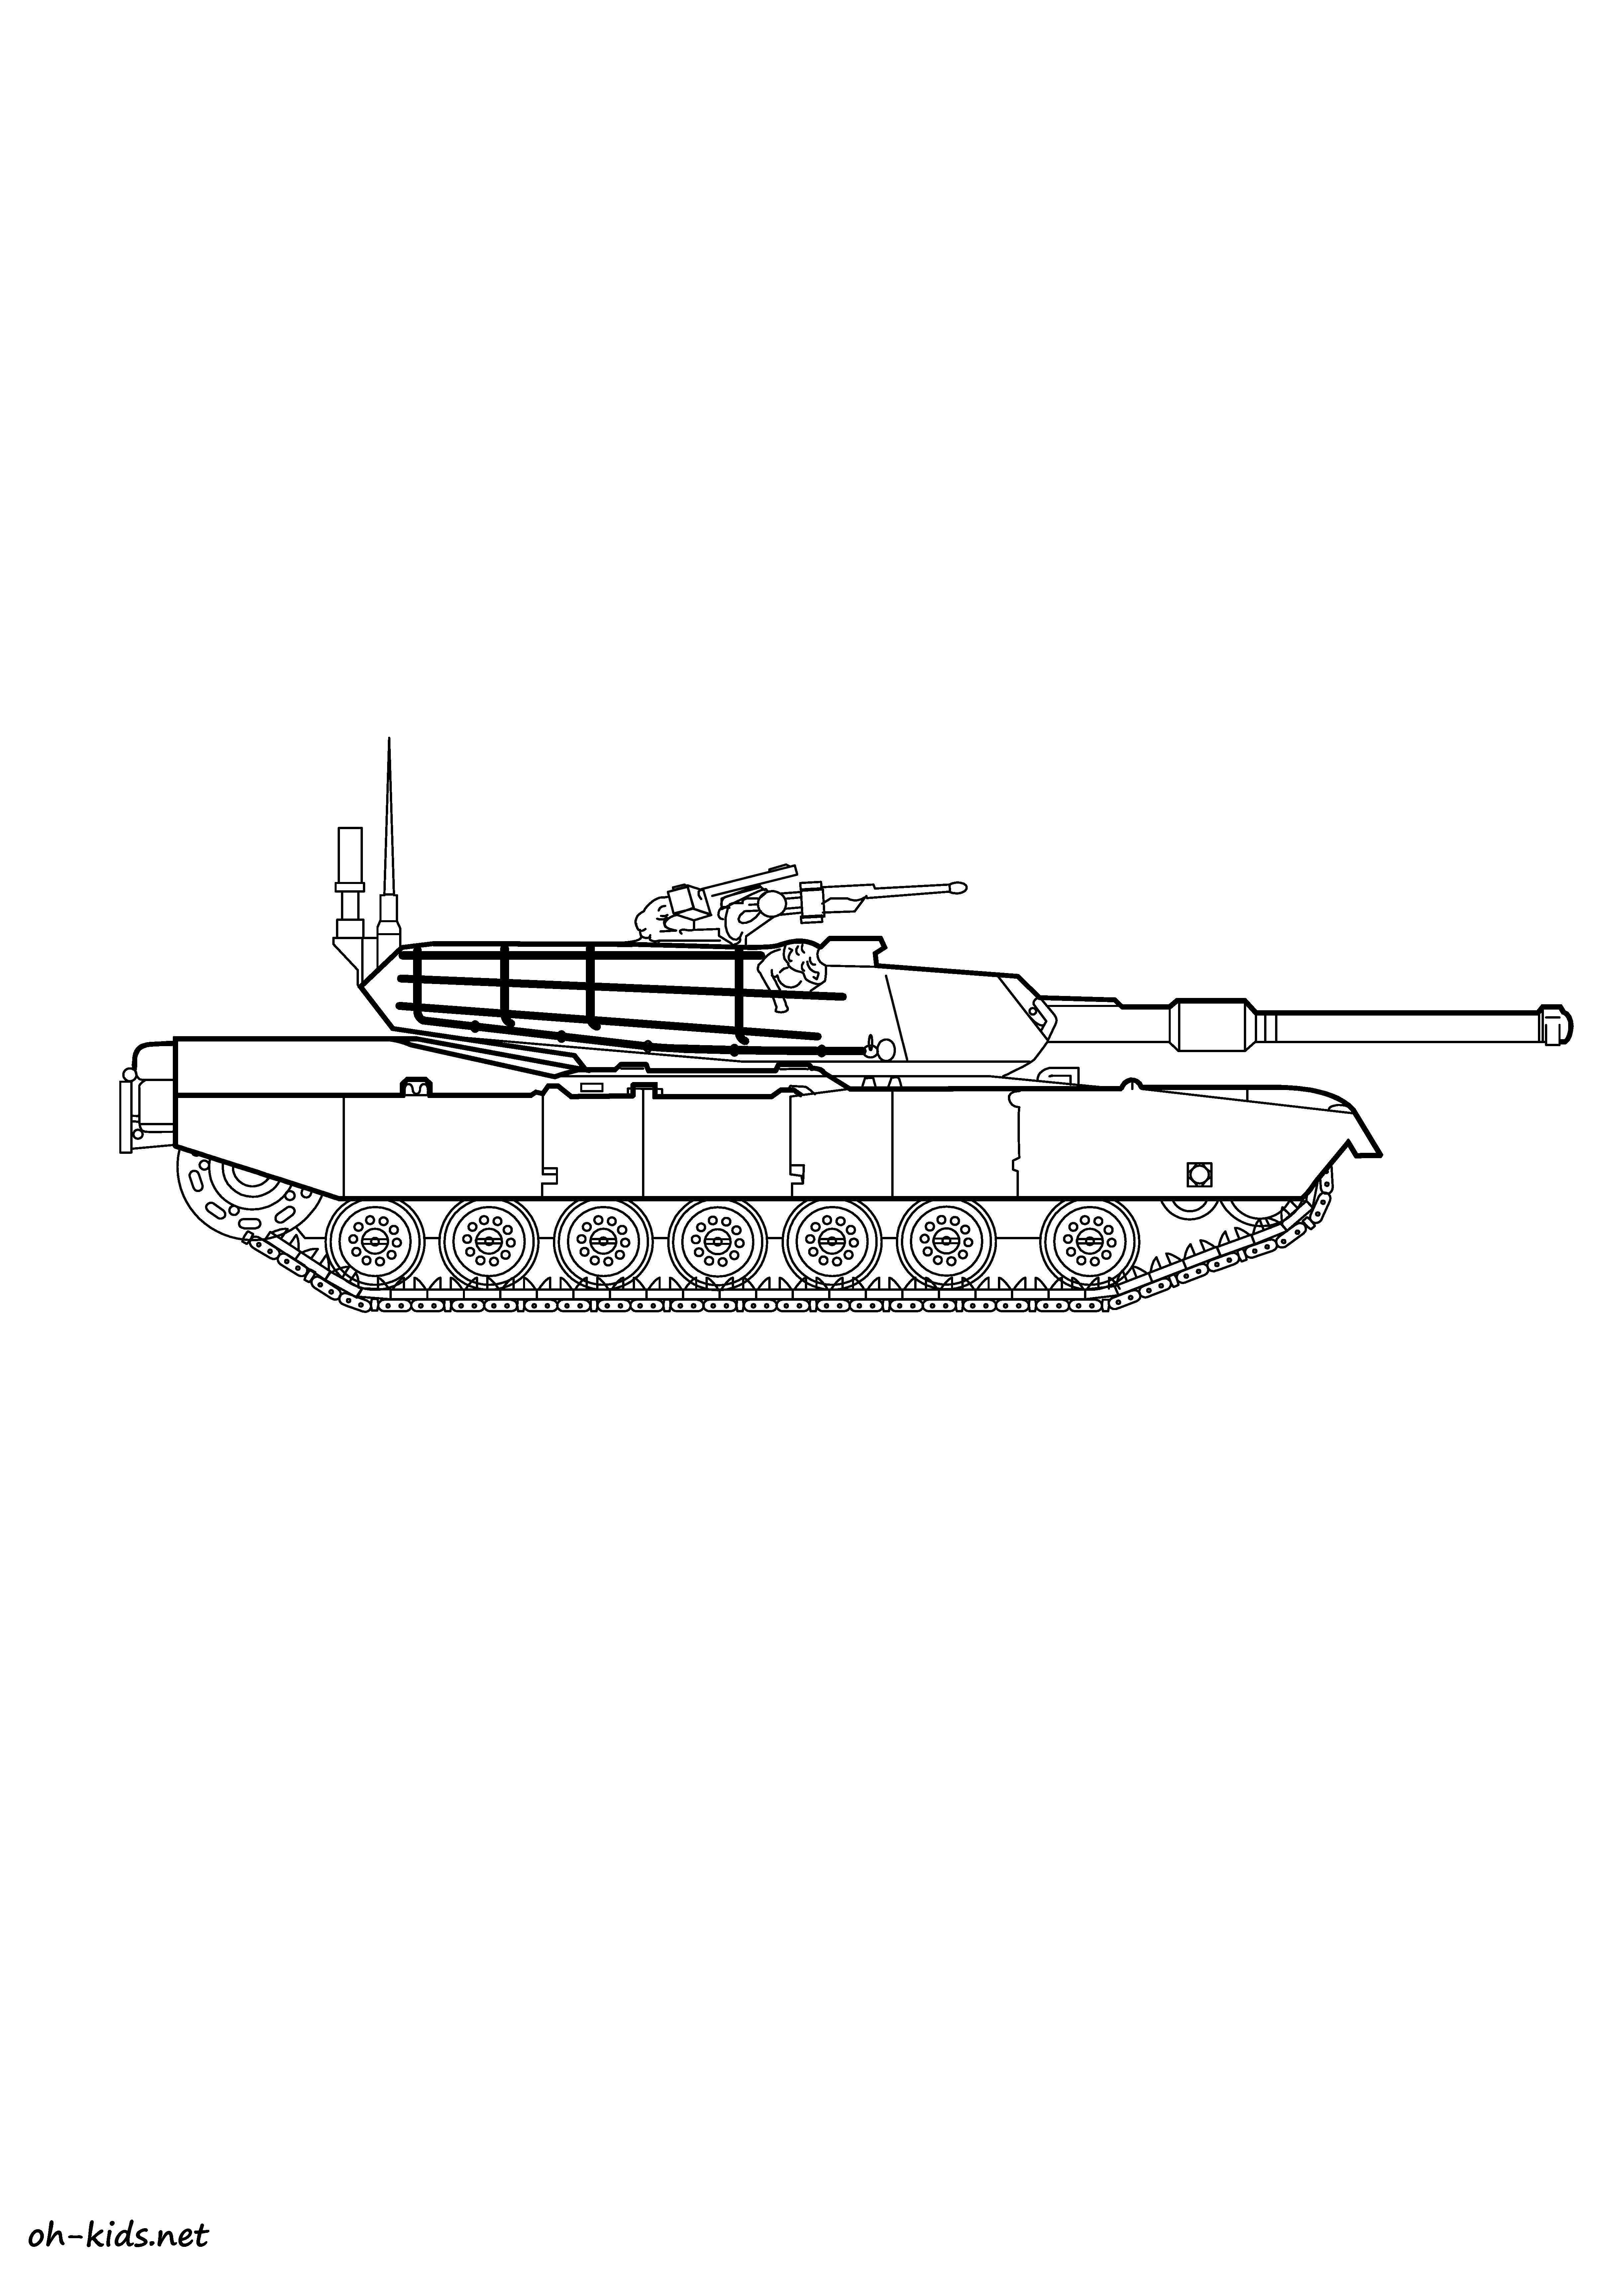 Pin coloriage tank on pinterest - Coloriage de tank ...